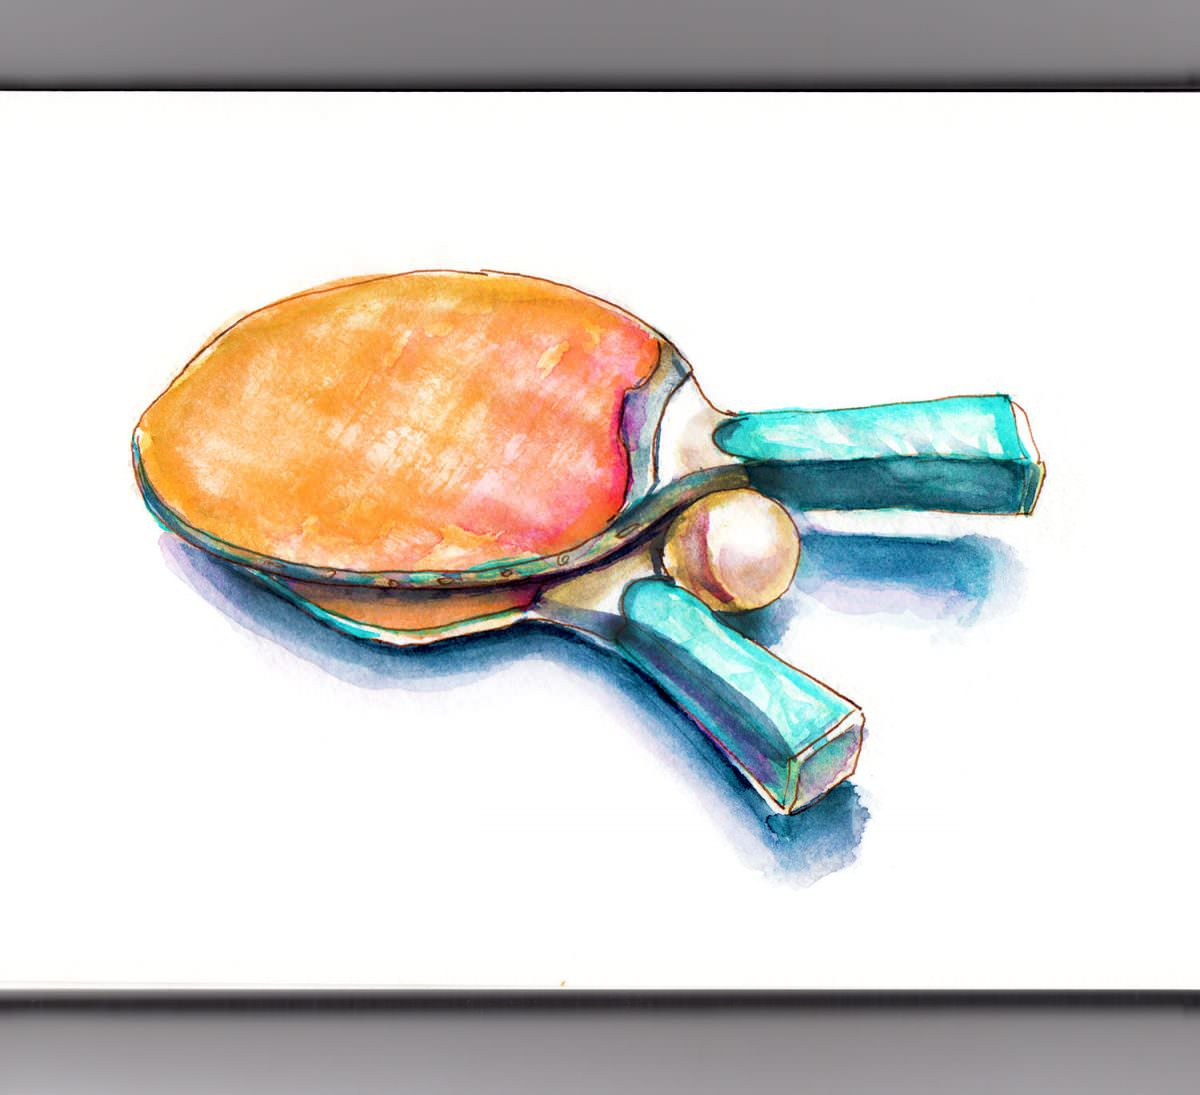 #WorldWatercolorGroup - Day 21 - Playing Games - Ping Pong - Doodlewash